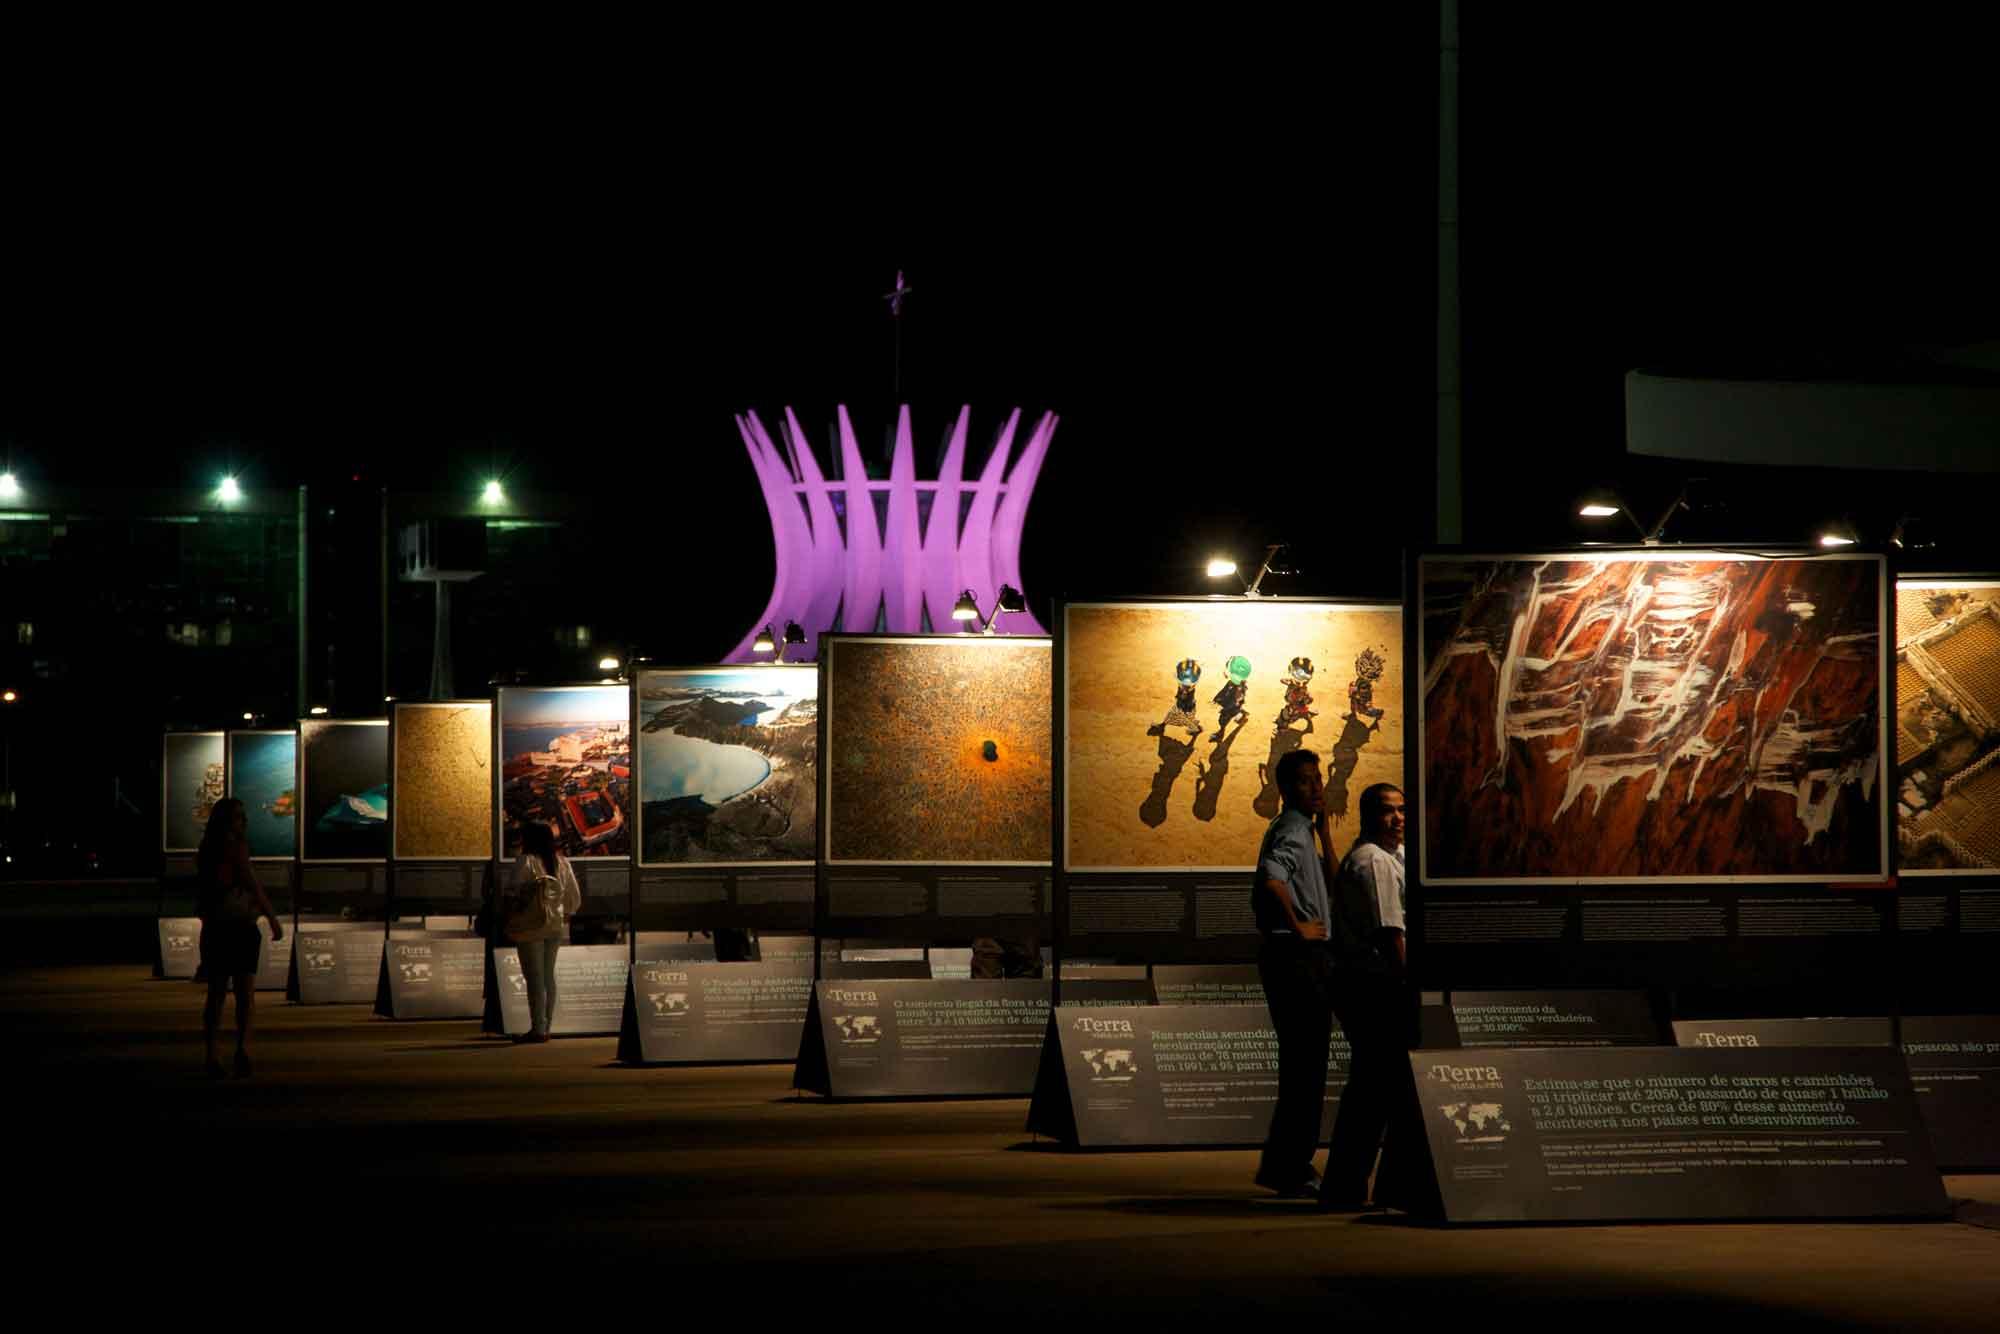 Bazilia - Les expositions en plein air de Yann Arthus-Bertrand